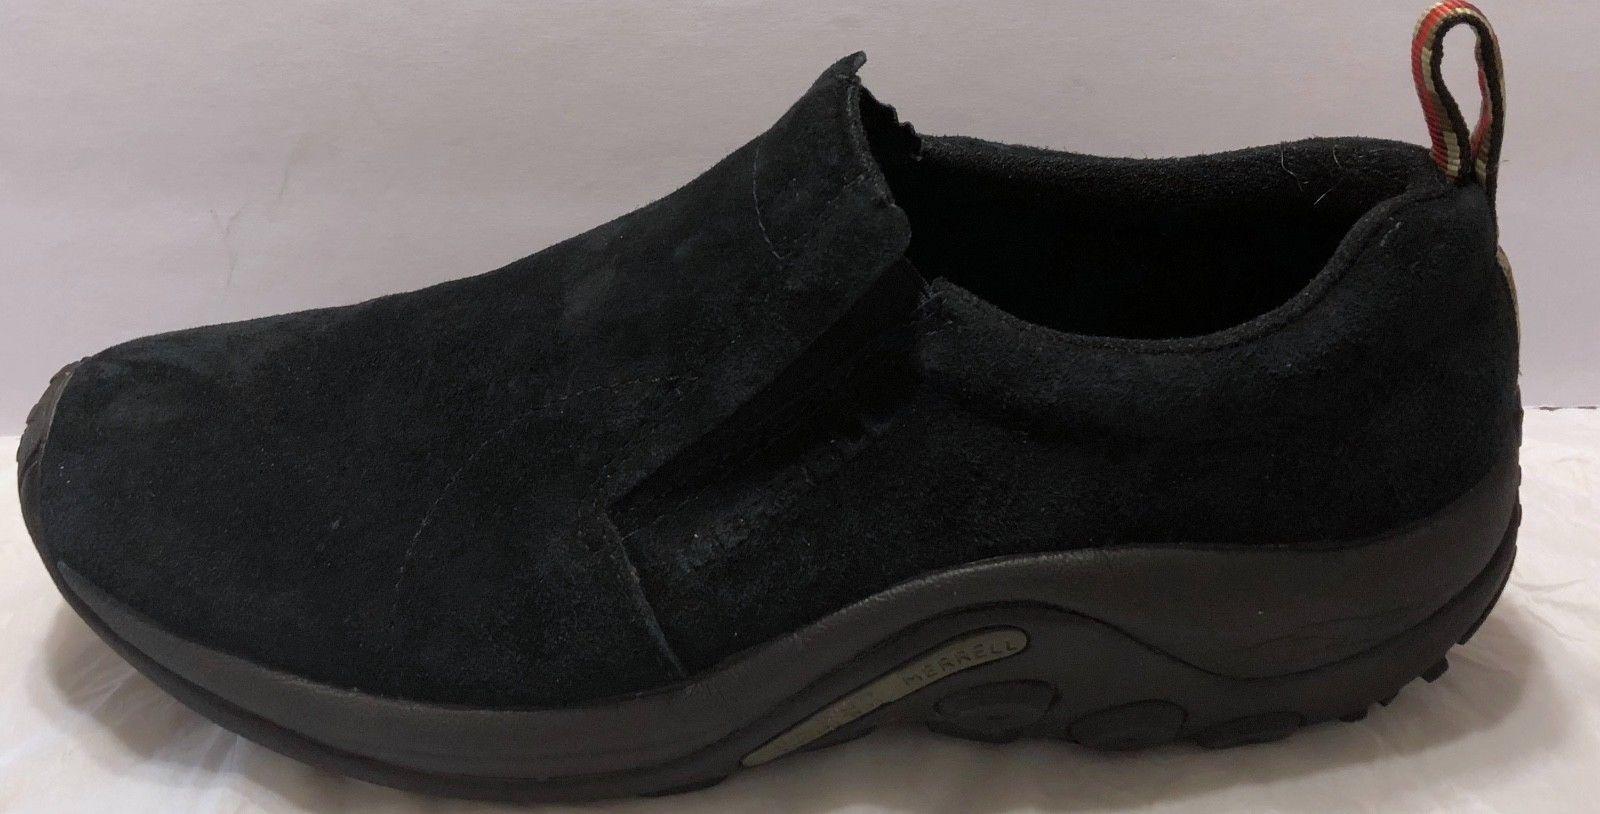 Merrell Midnight Moc Black Nubuck Shoes Size 11.5 Slip On Hiking Trail Walking